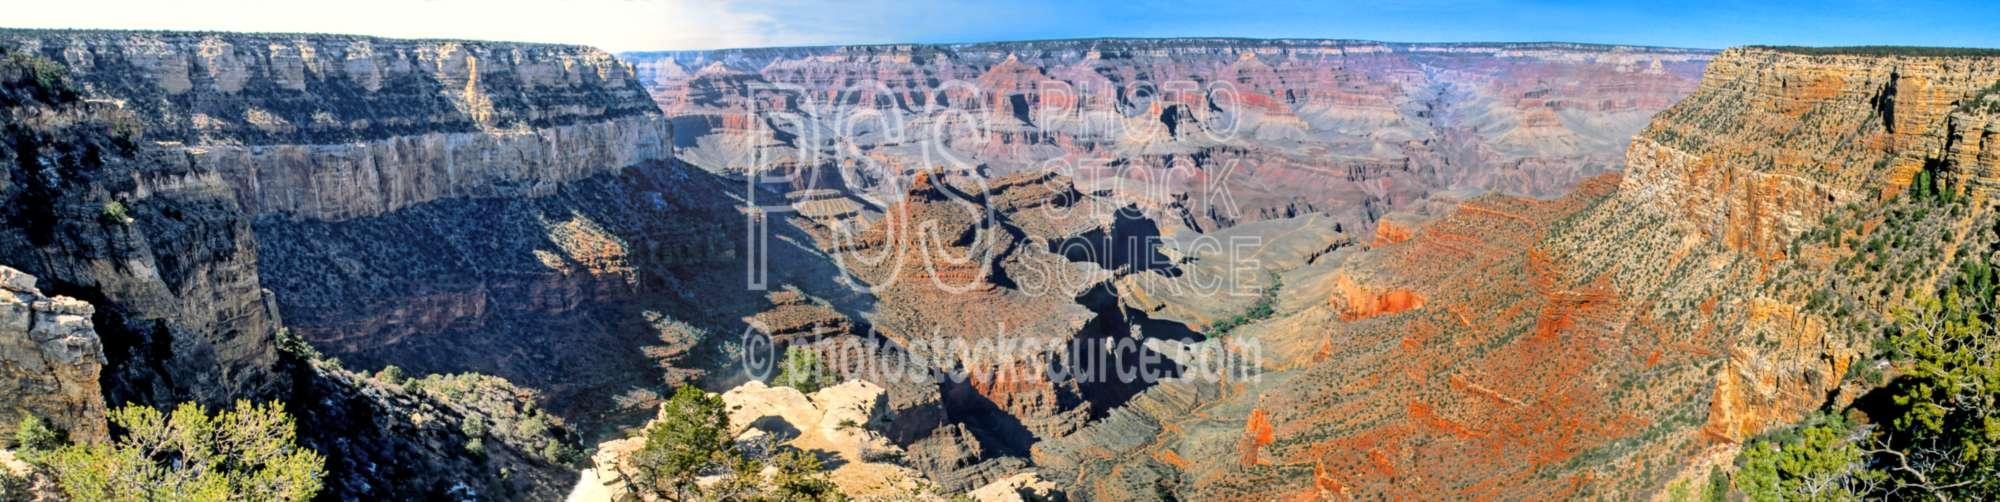 Grand Canyon near Hopi House